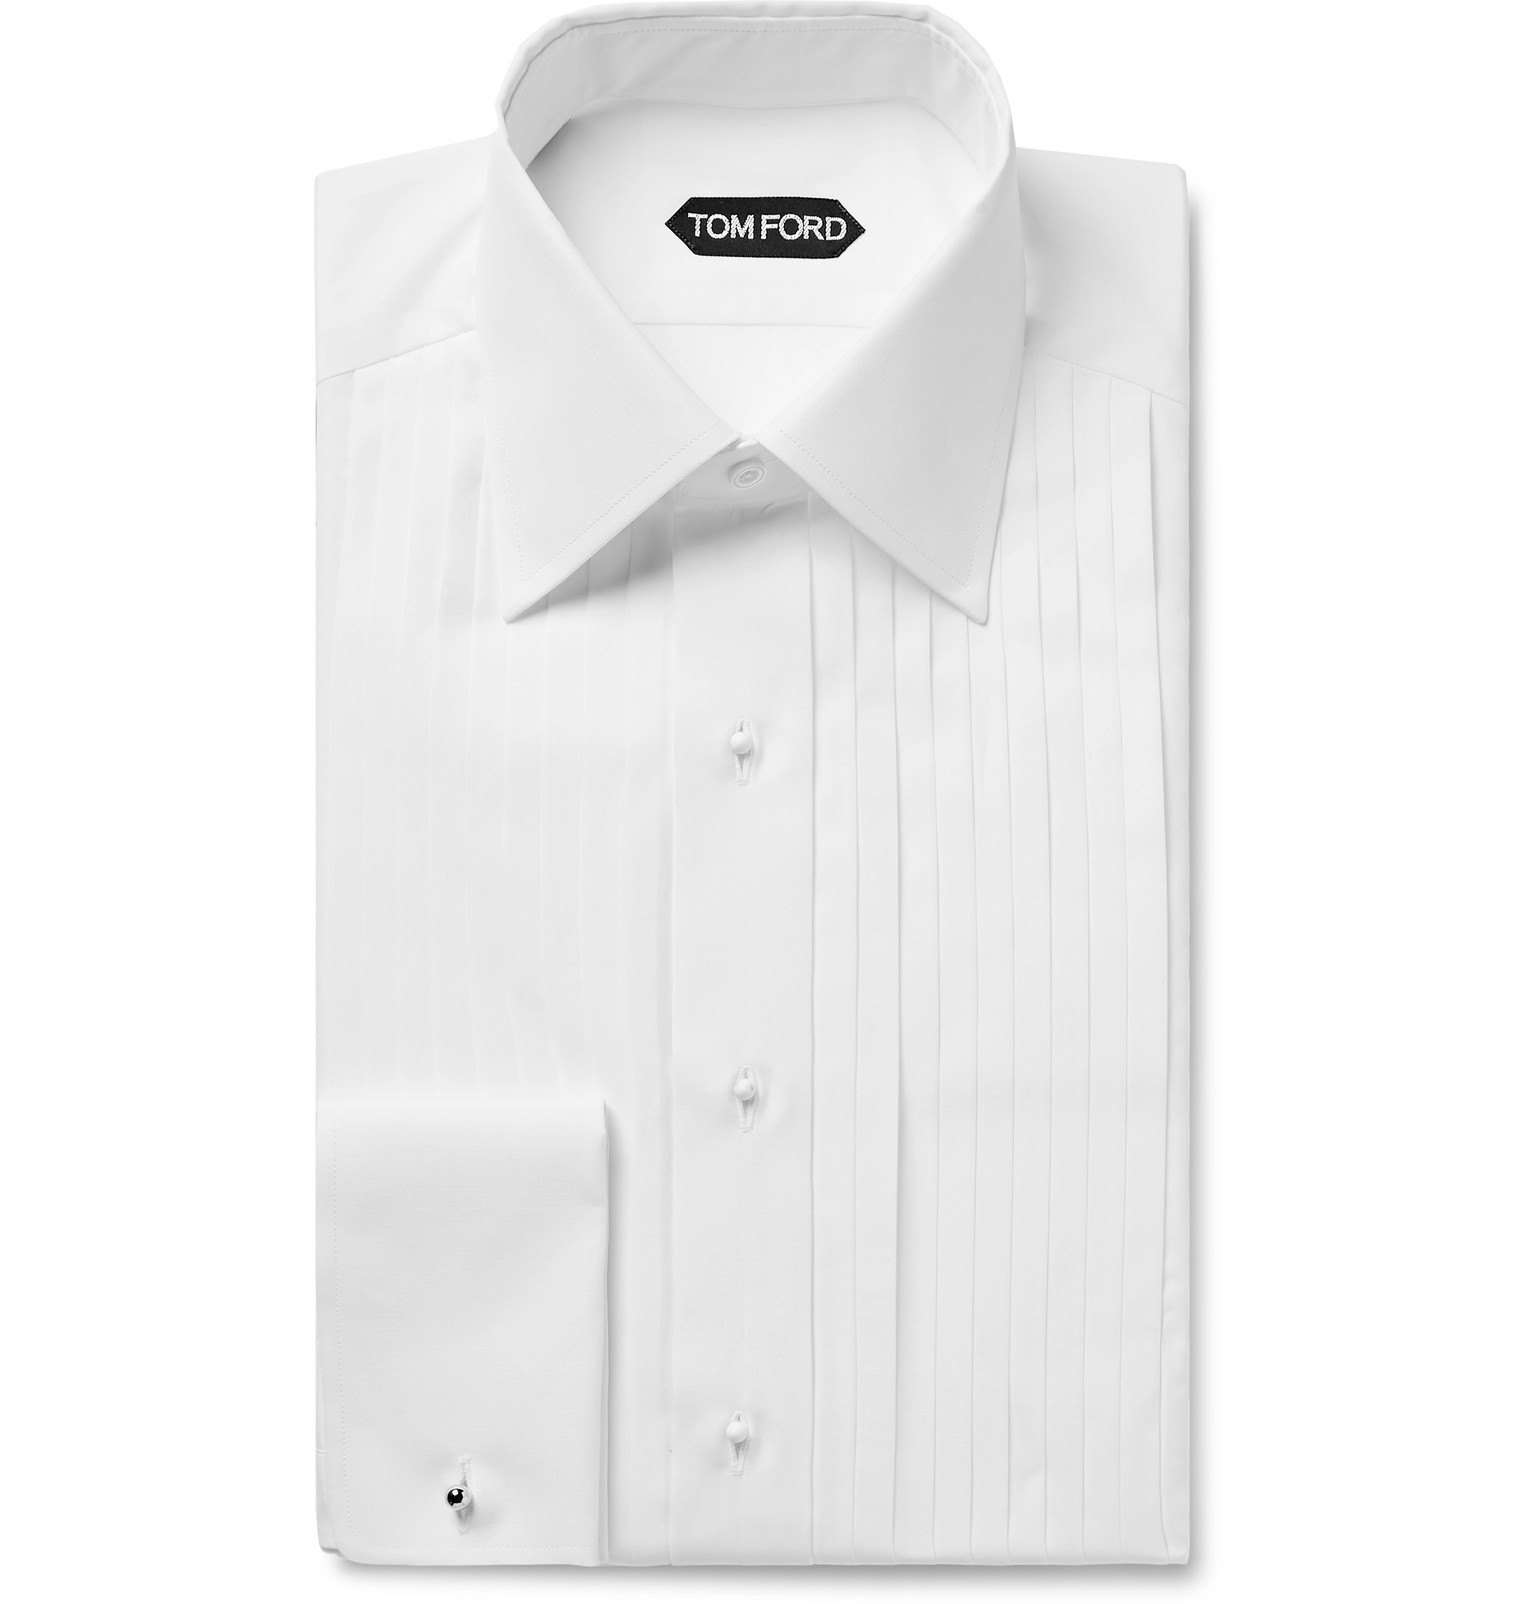 Tom Ford White Slim Fit Bib Front Double Cuff Sea Island Cotton Shirt